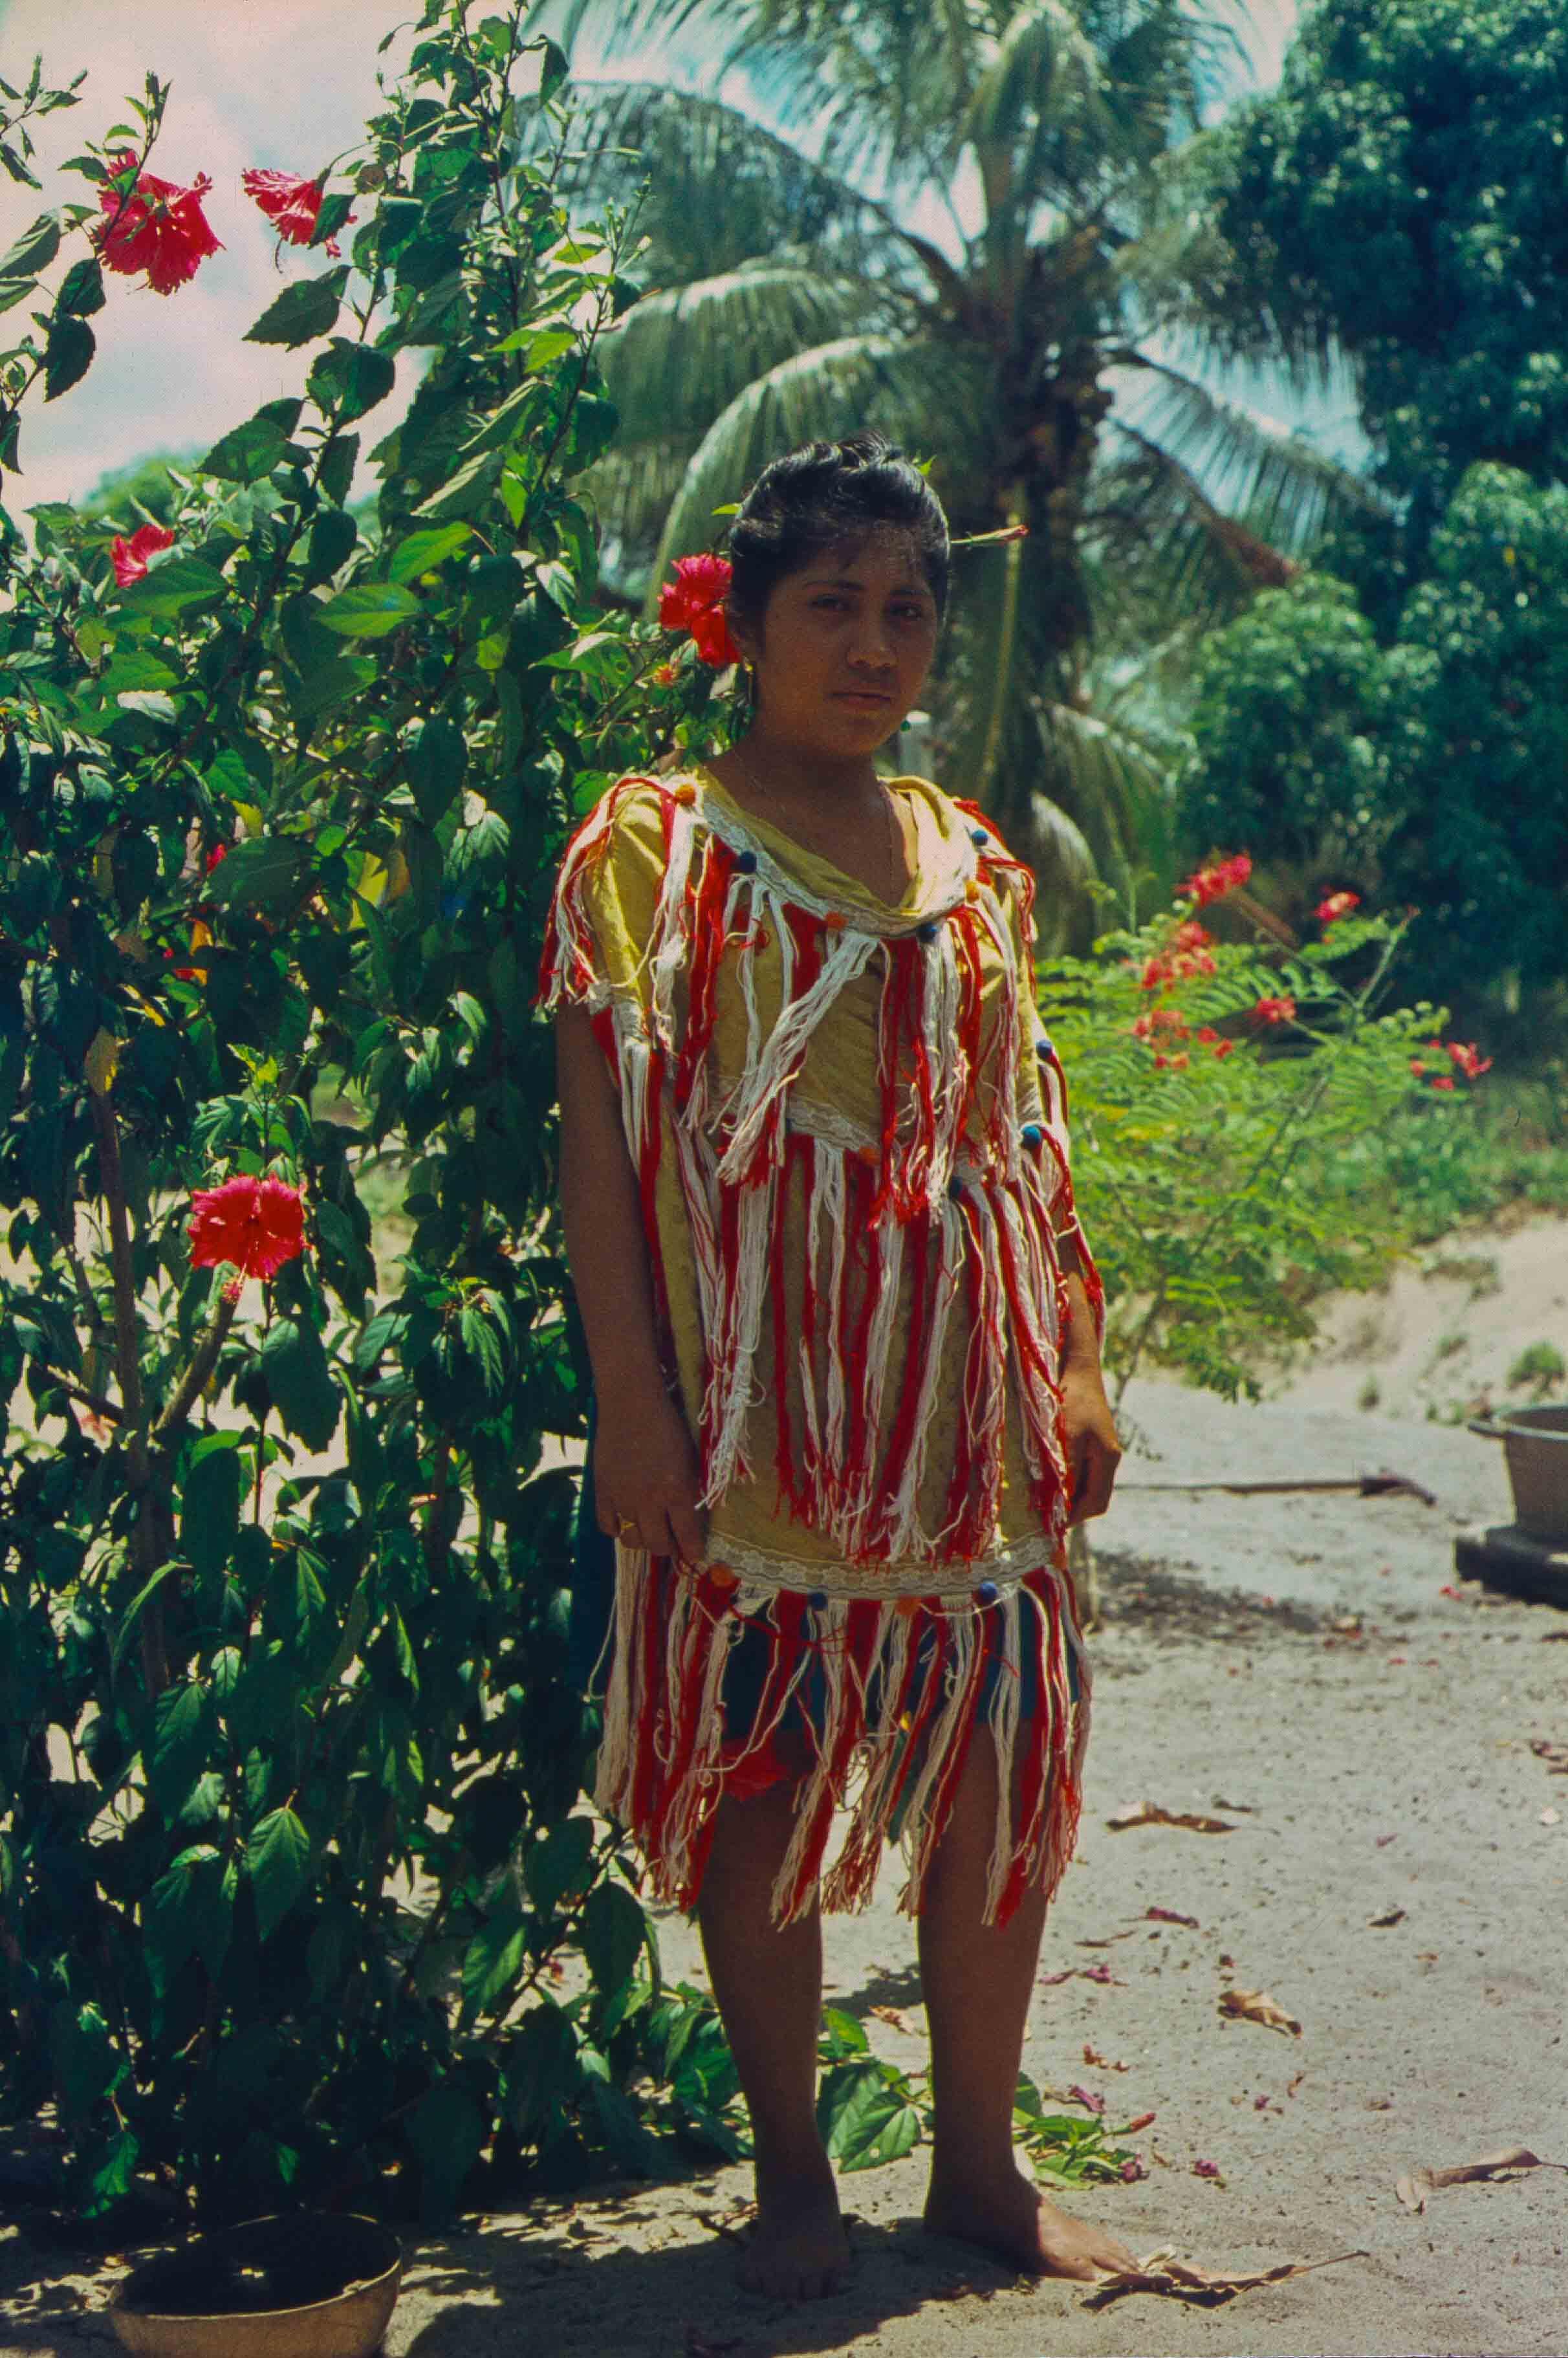 405. Suriname